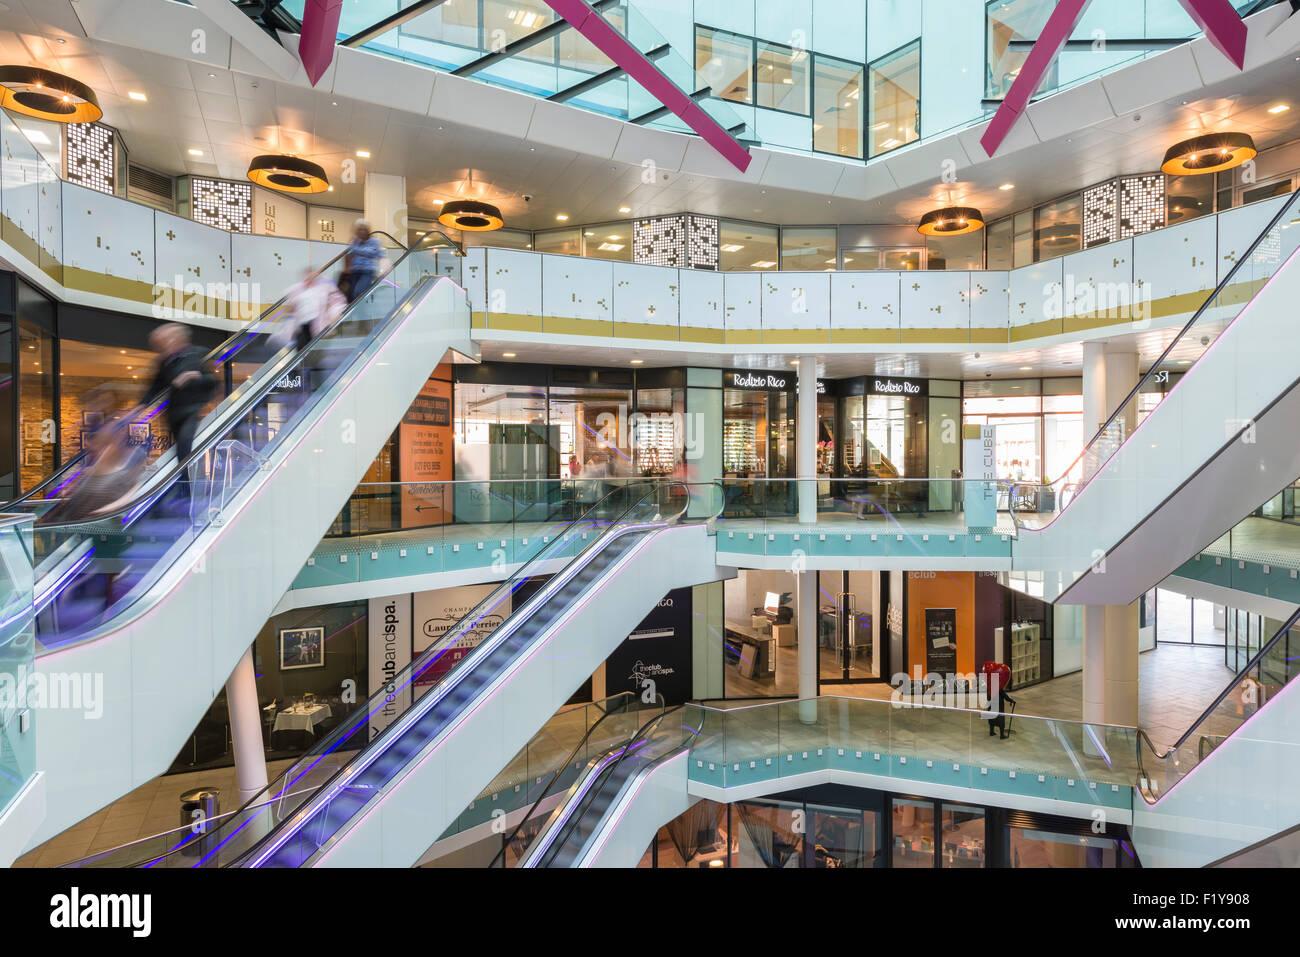 The Cube building, Birmingham, England - Stock Image